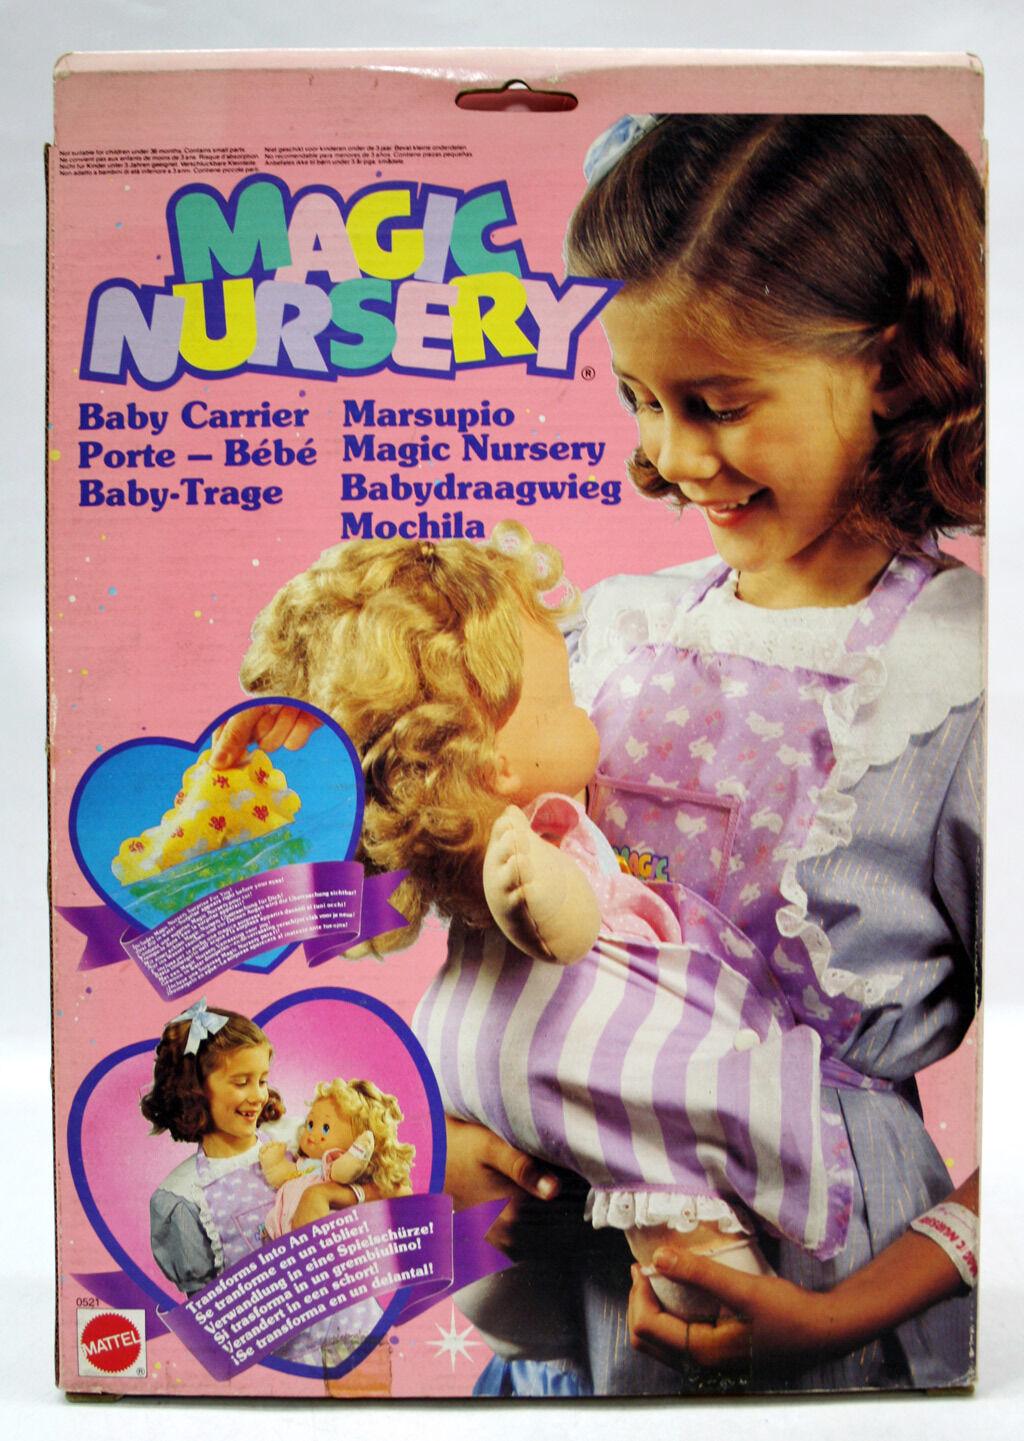 VERY RARE VINTAGE 1990 MAGIC NURSERY BABY CARRIER MATTEL NEW MIB